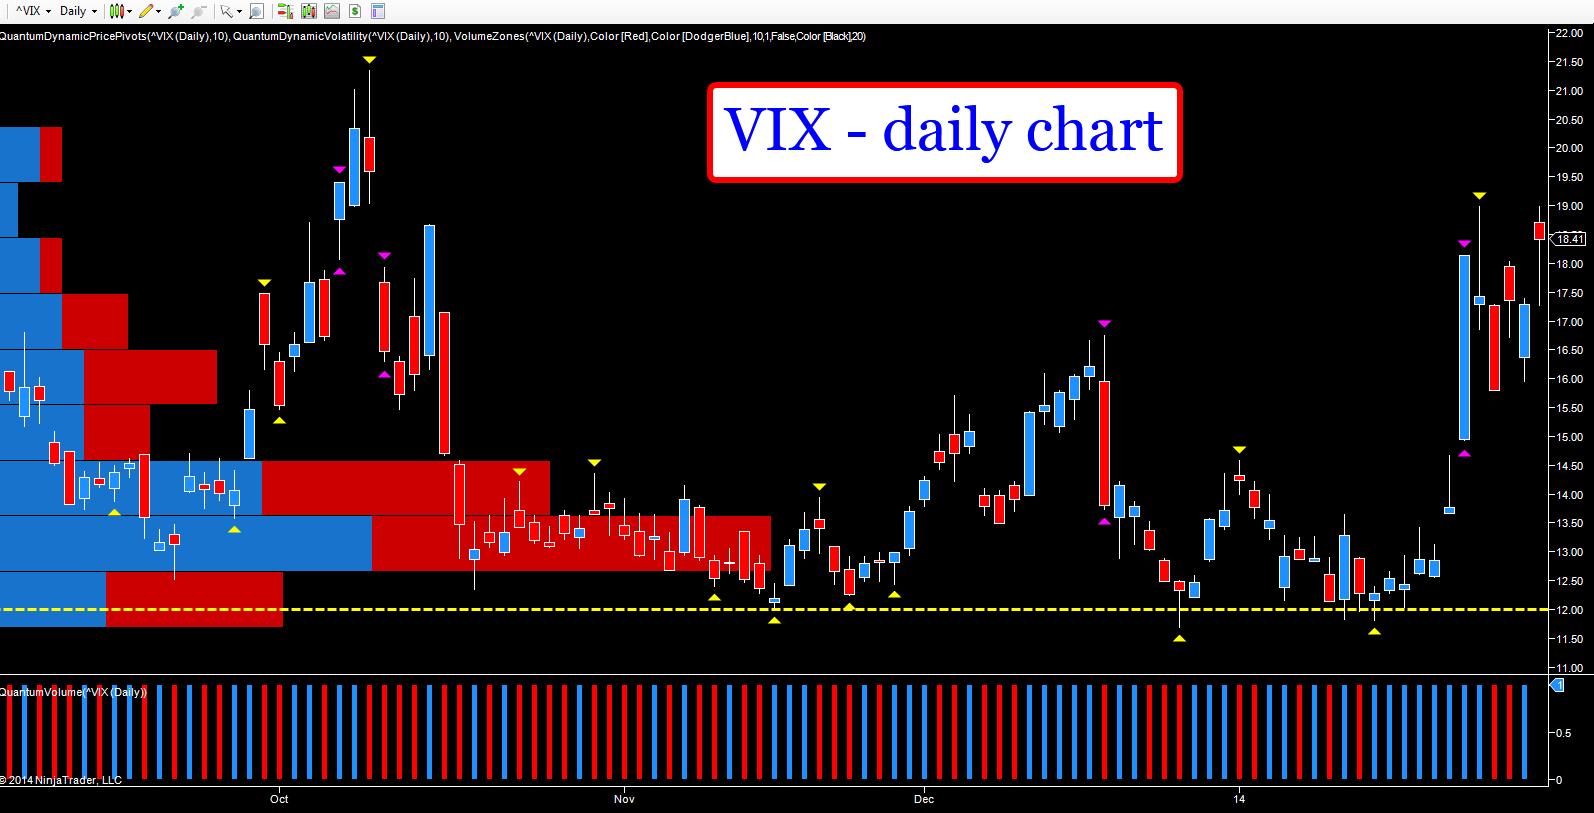 VIX - daily chart